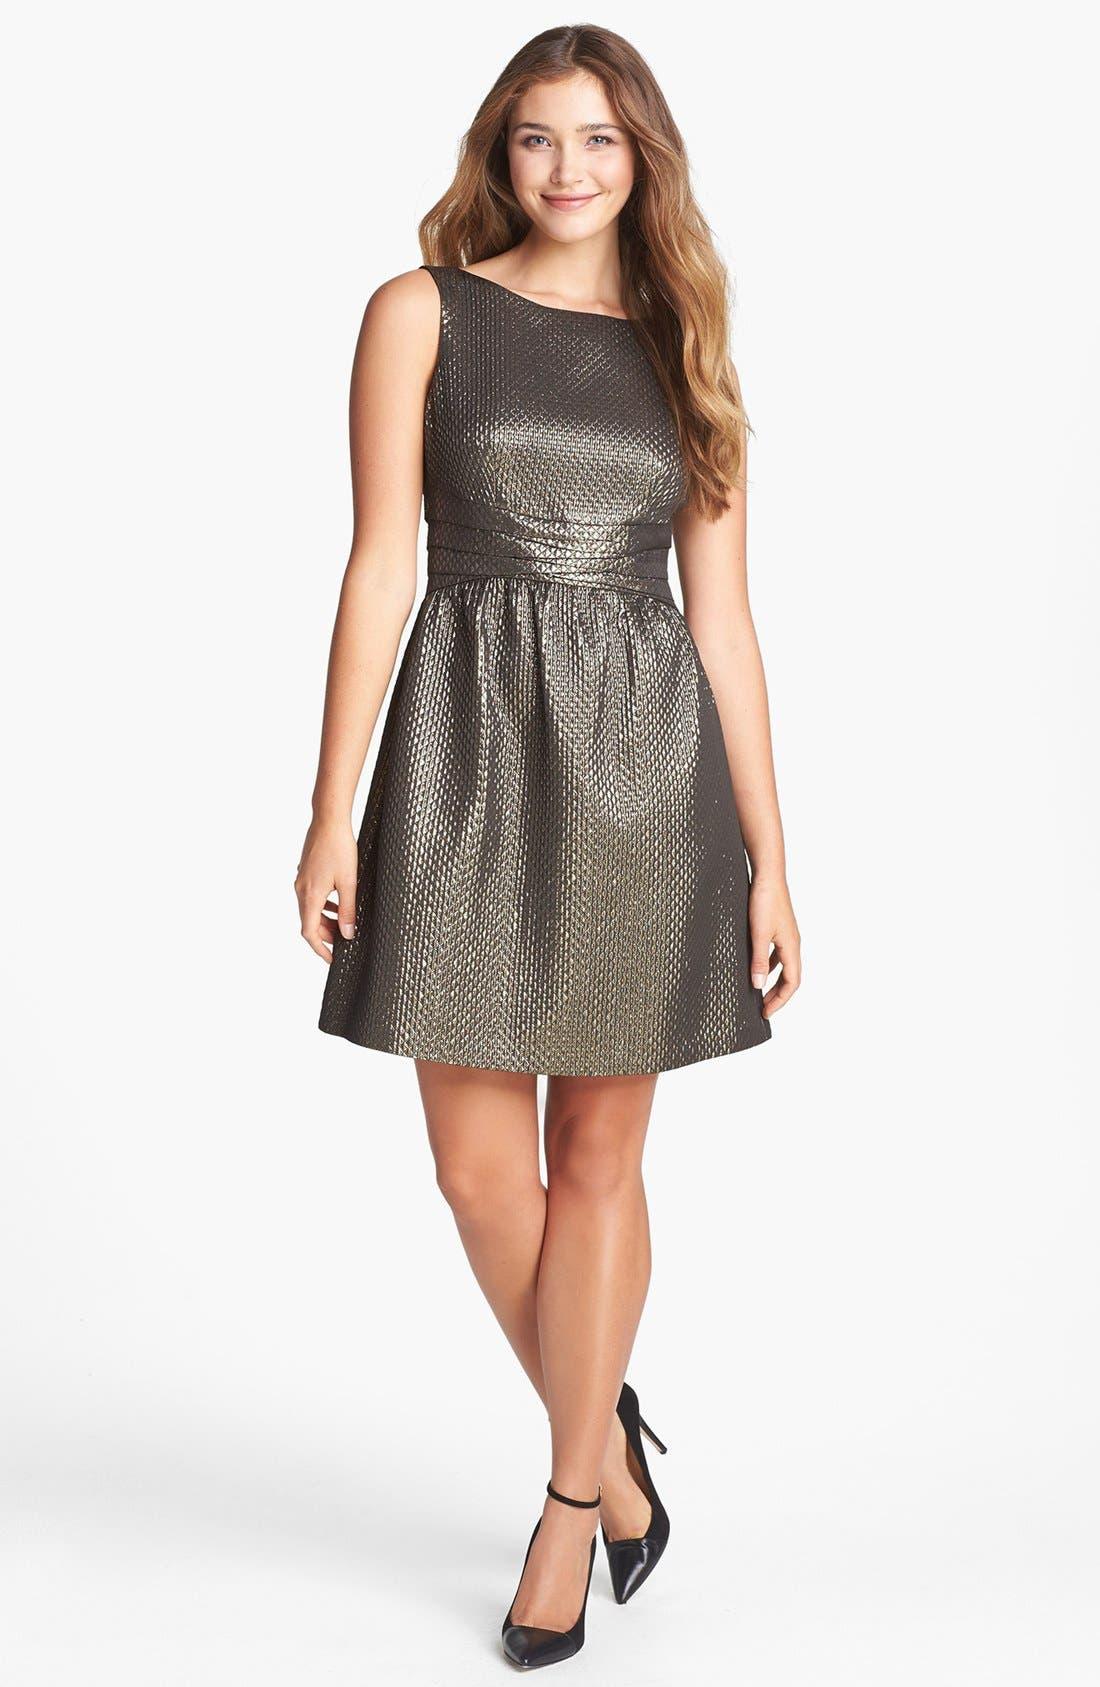 Main Image - Ivy & Blu Metallic Jacquard Fit & Flare Dress